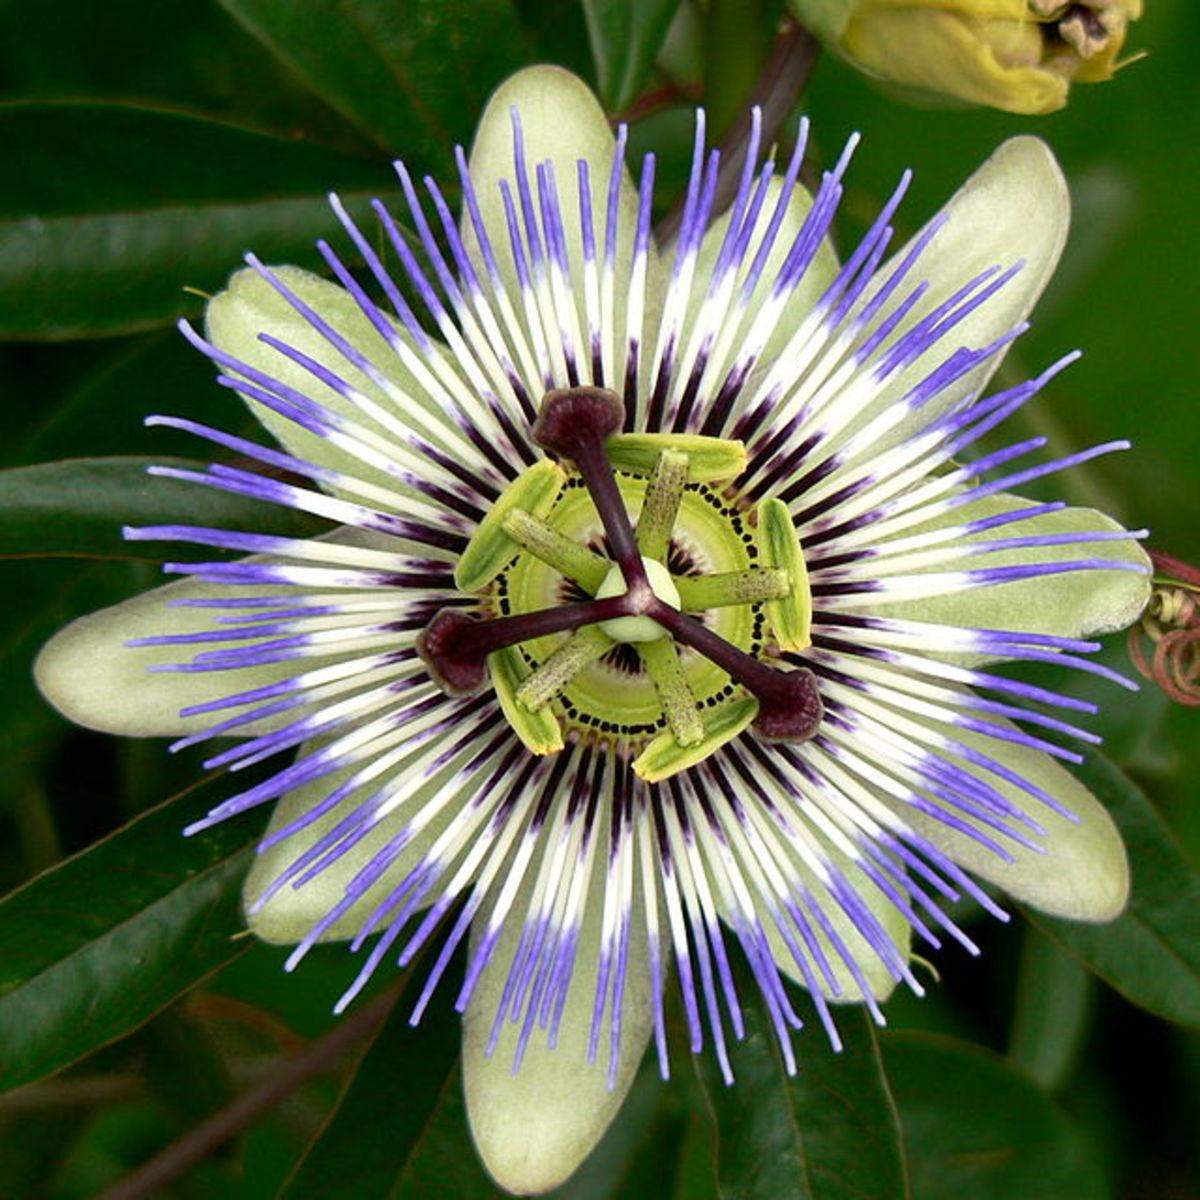 Passiflora caerulea flower.